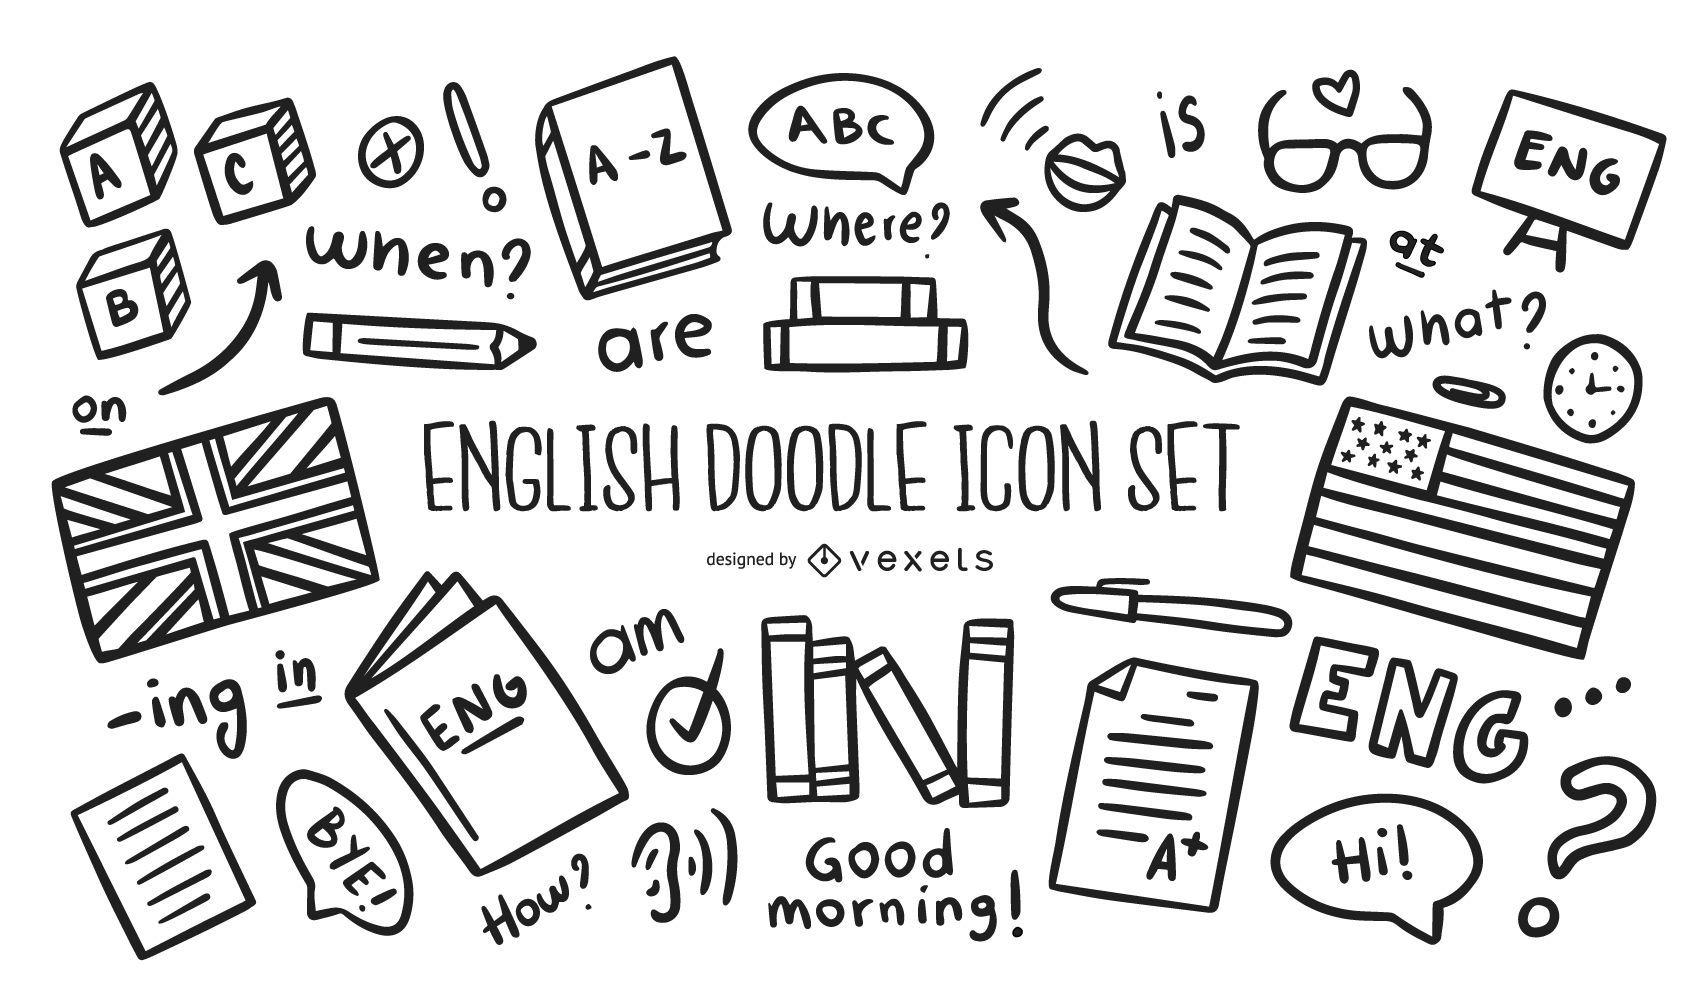 Englisch Doodle Icon Set